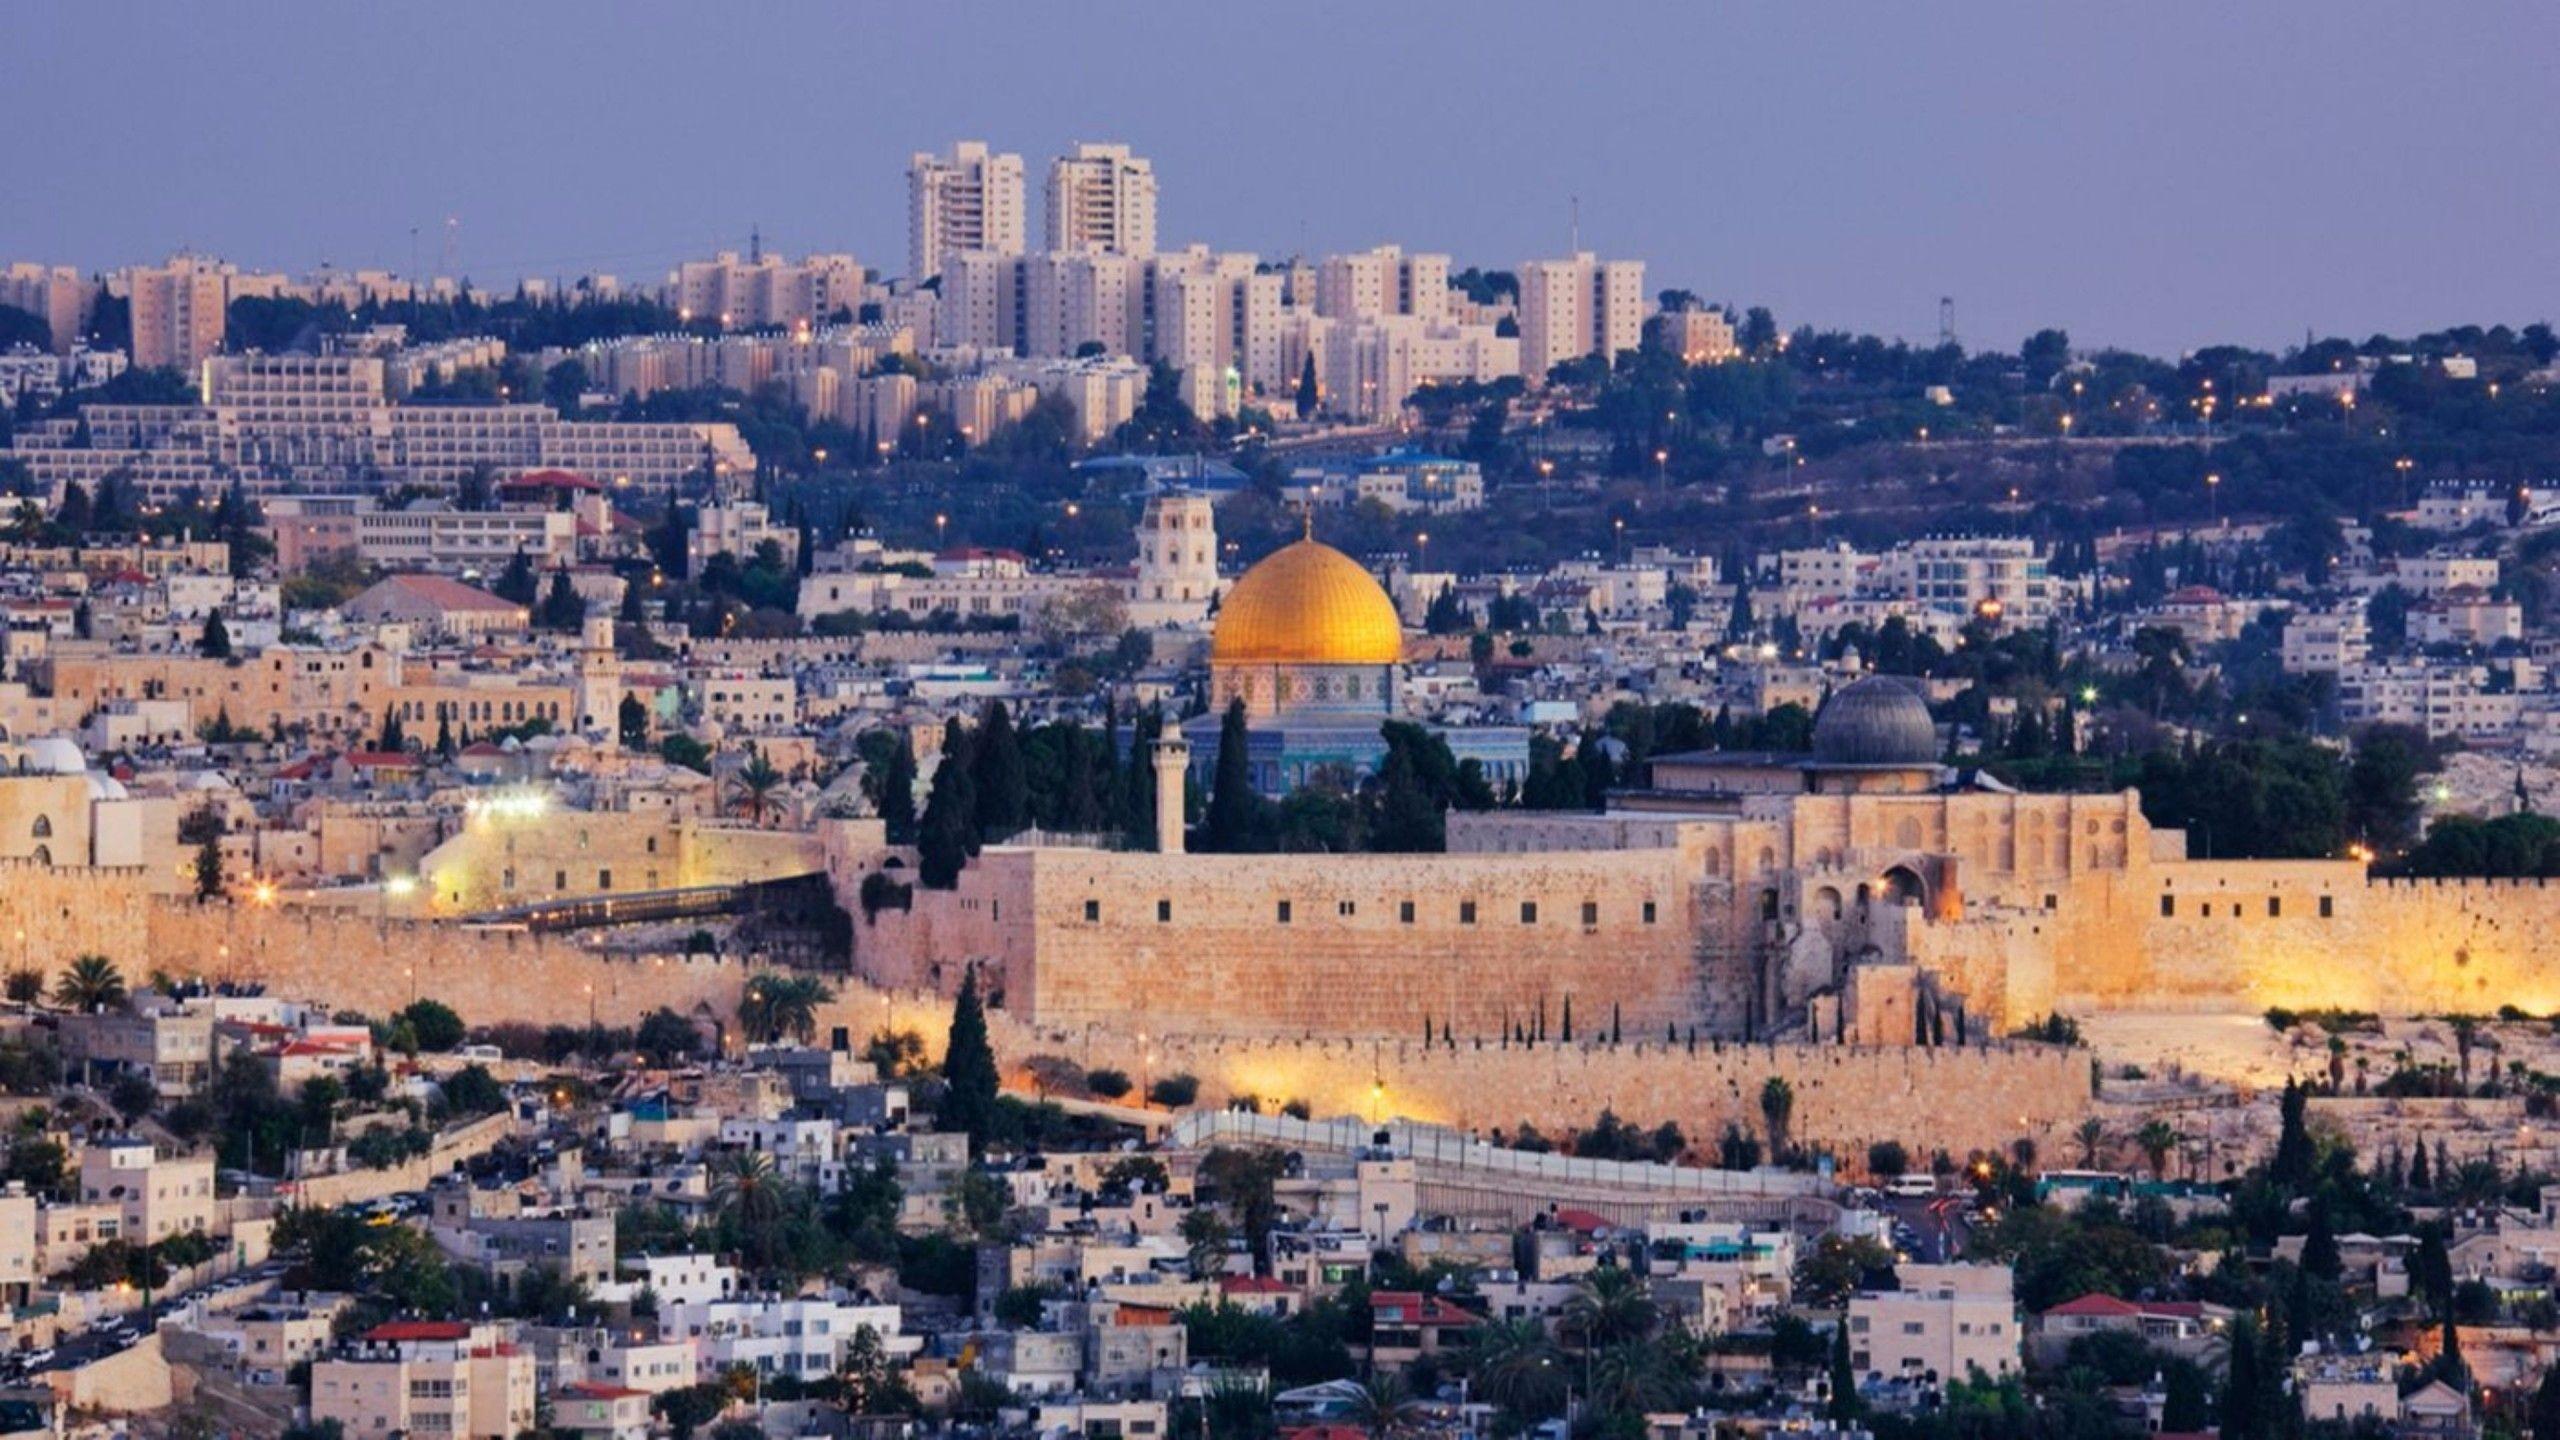 Trending Wallpapers For Iphone X Jerusalem Wallpaper 183 ①